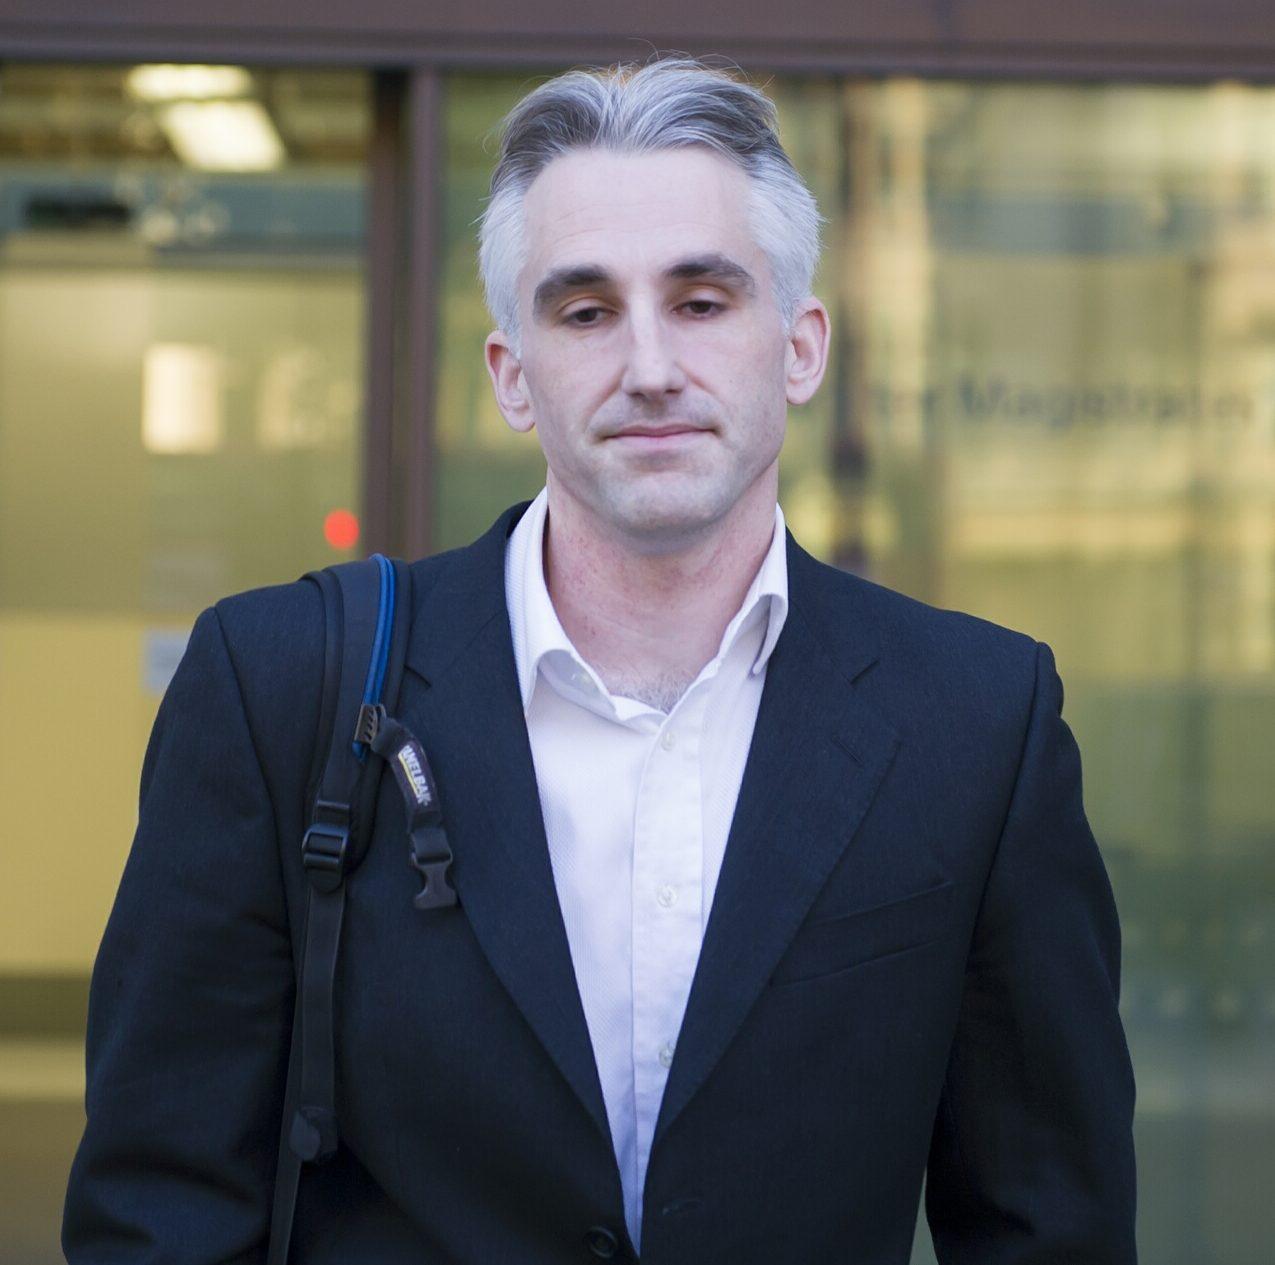 Christine Lampard stalker faces jail